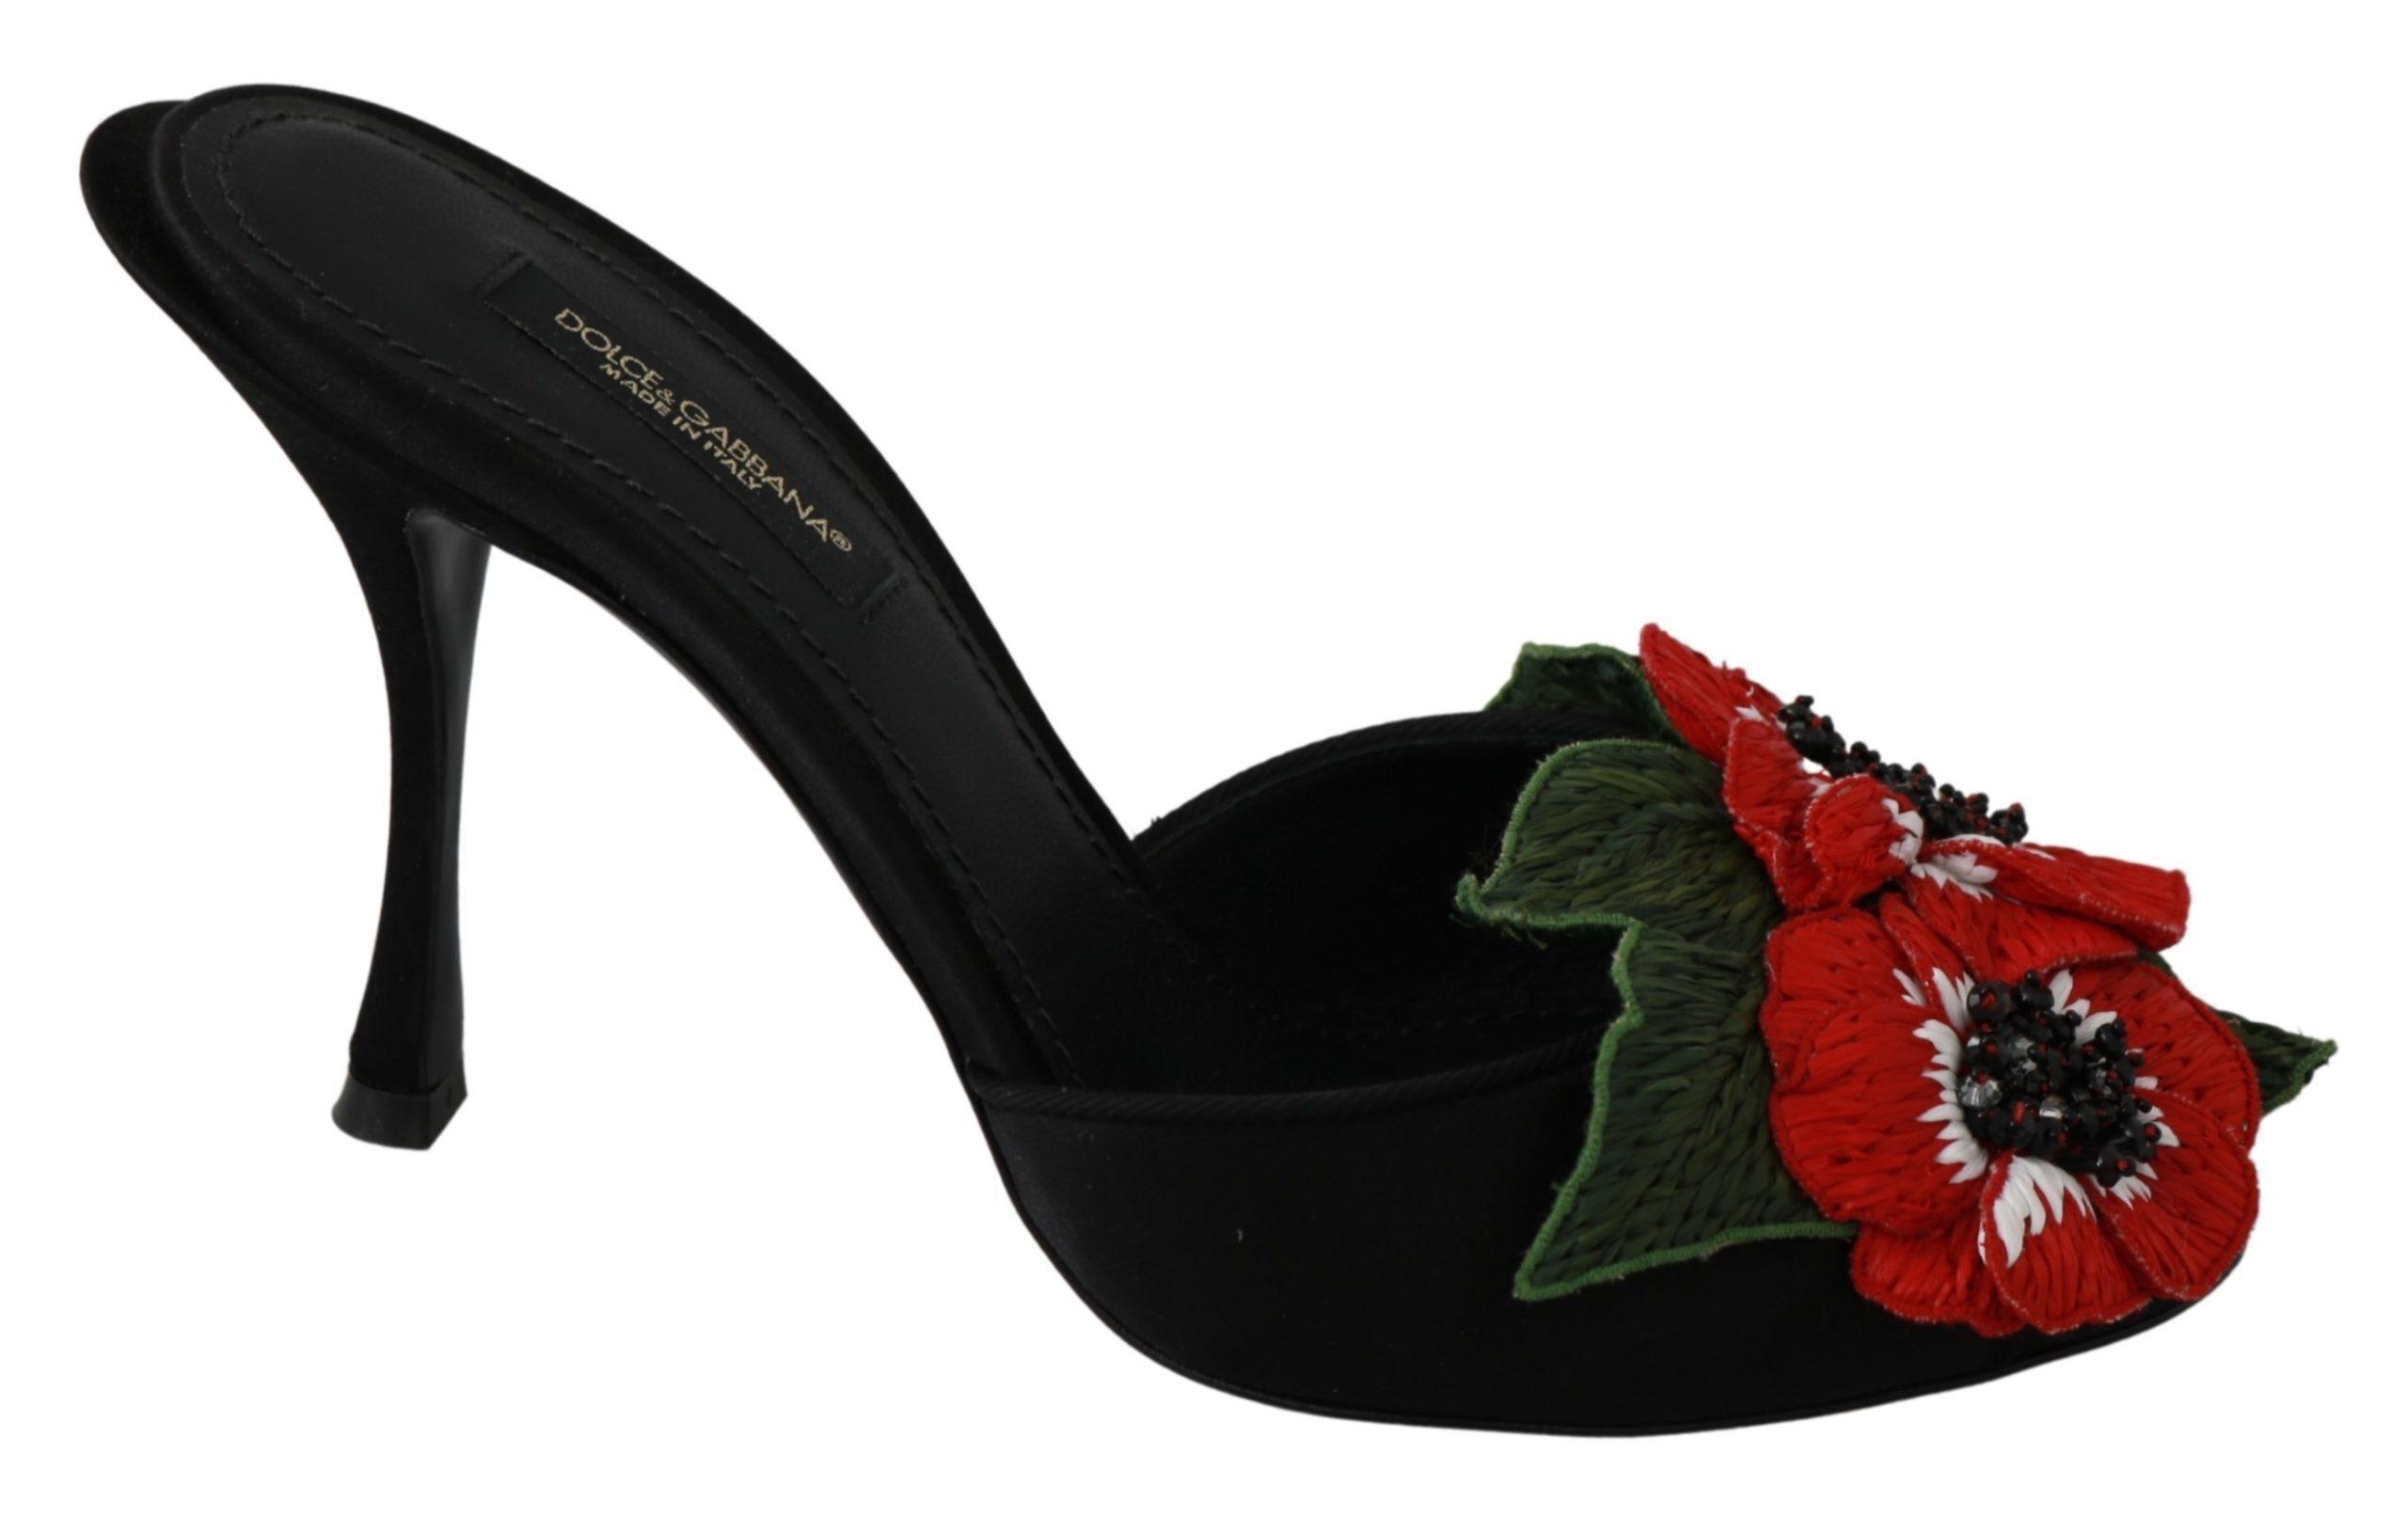 Black Silk Floral Heels Flip Flops Shoes - EU35/US4.5